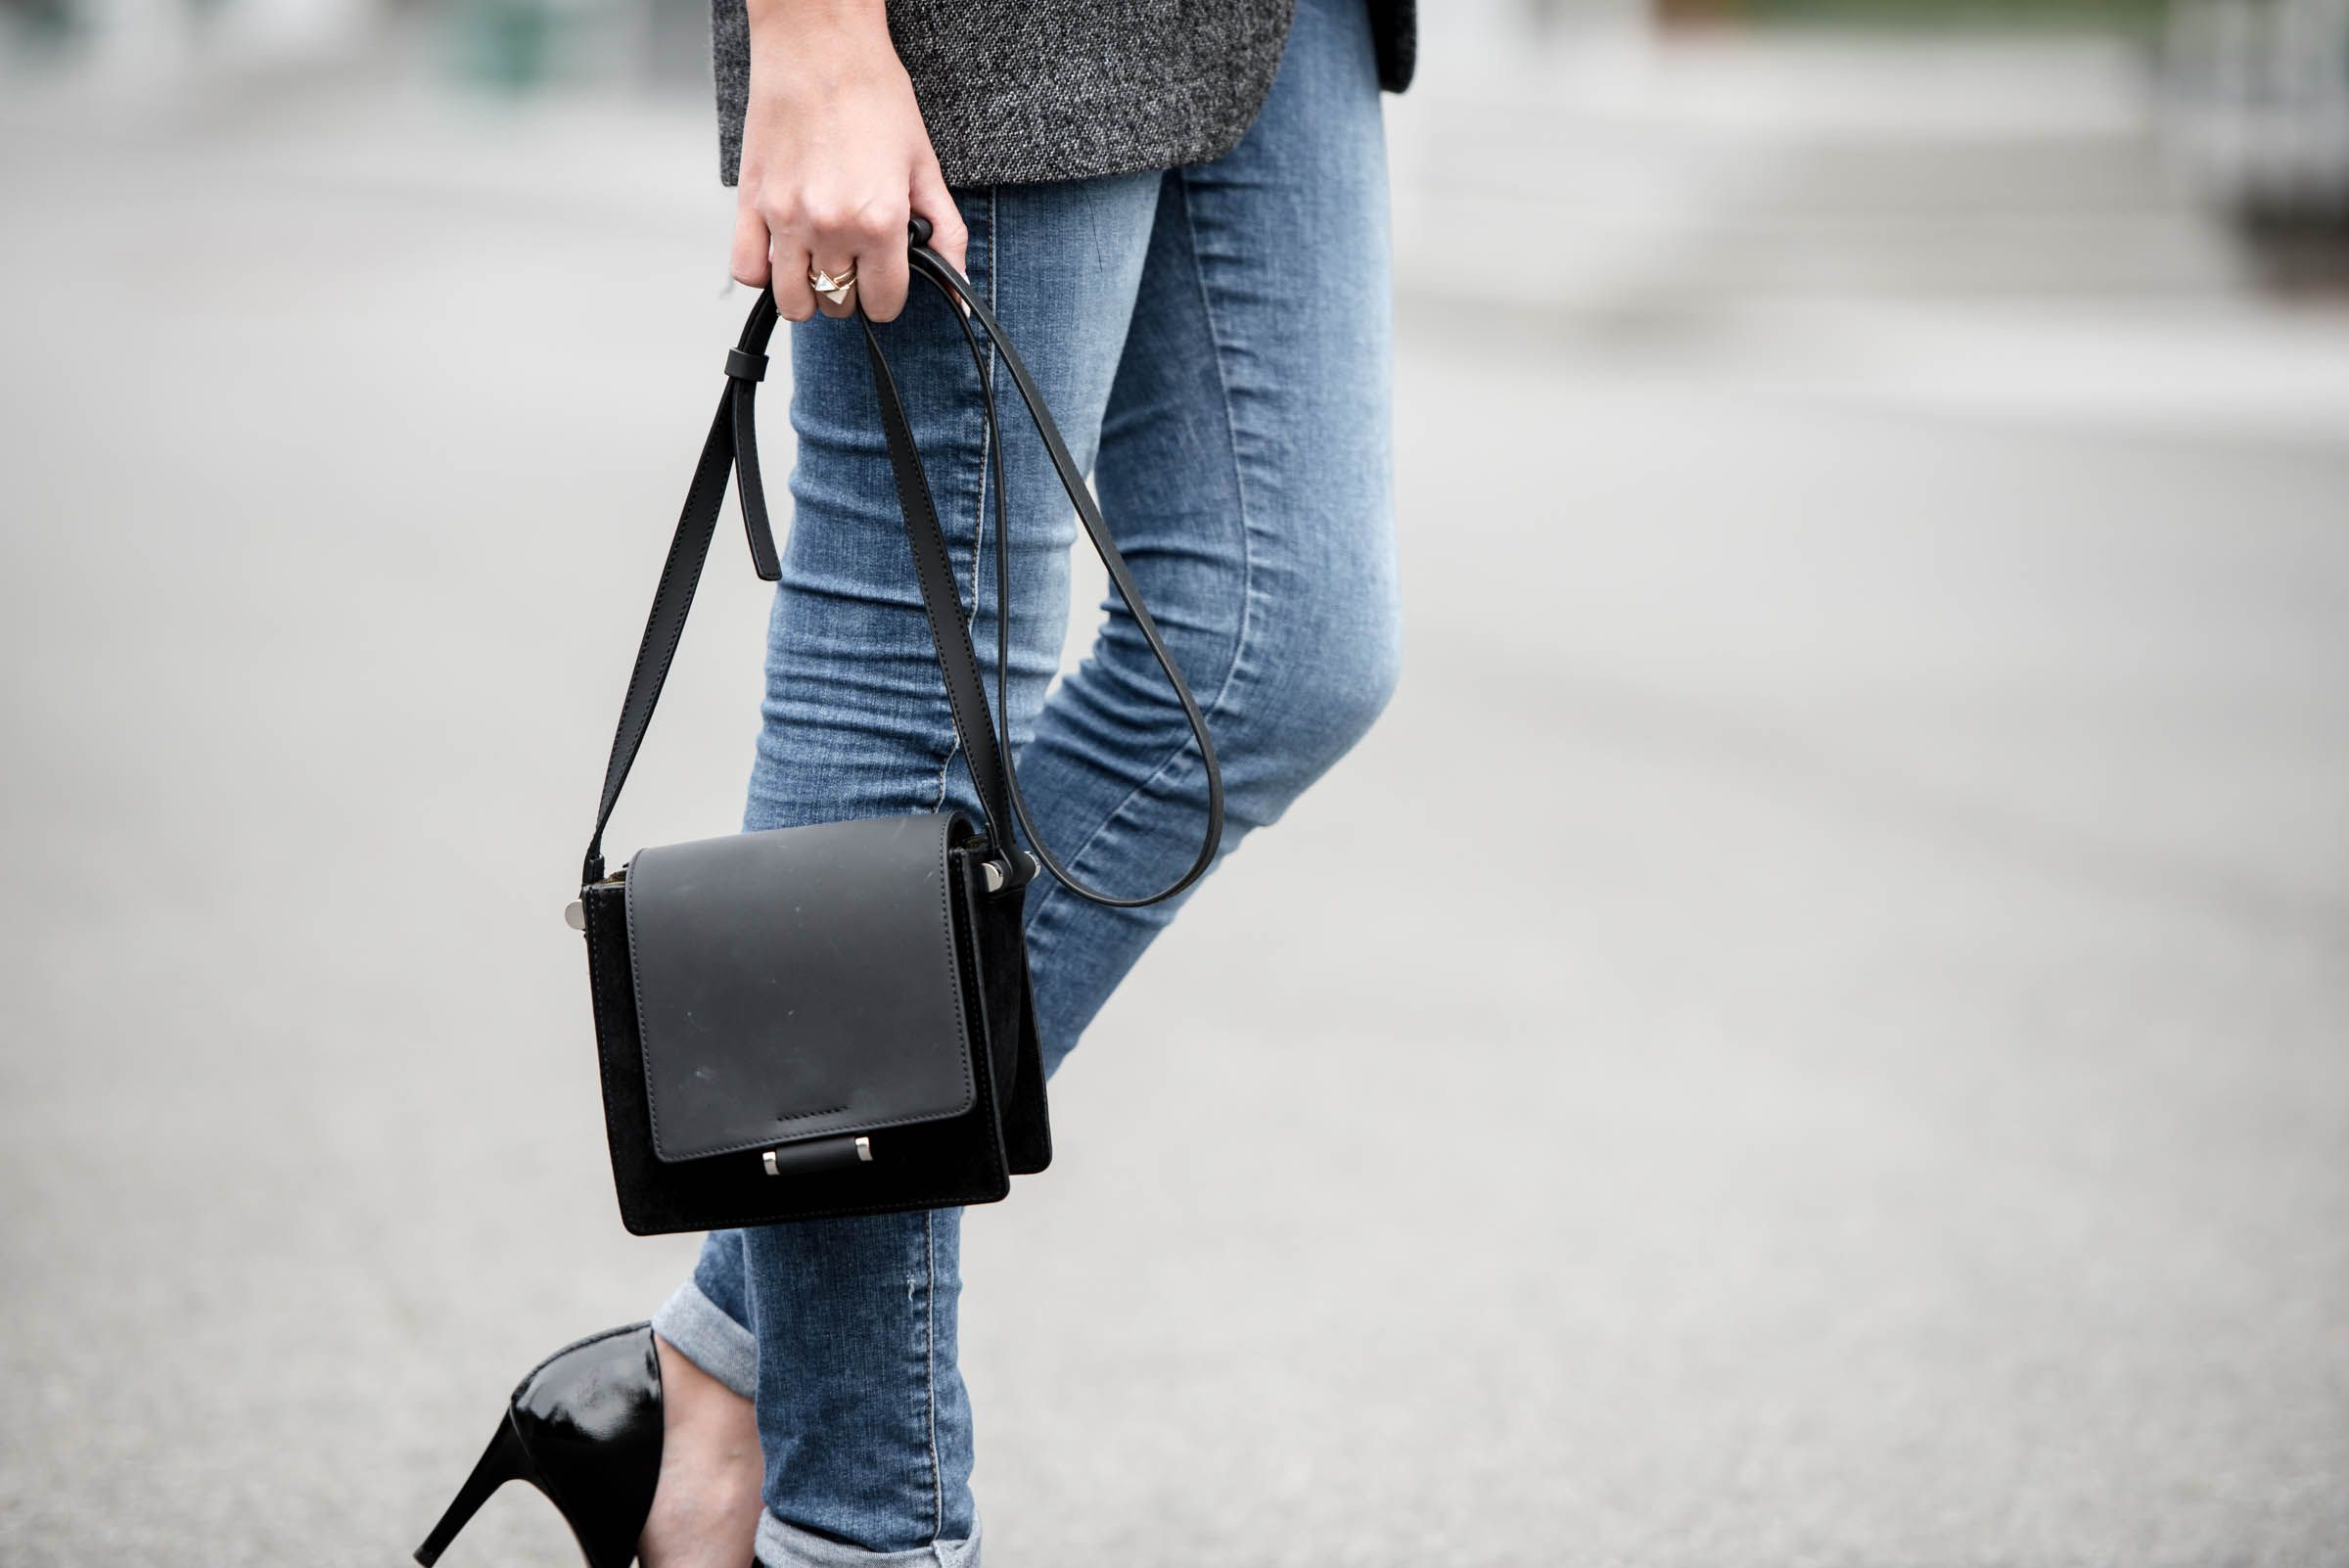 blazer-by-malene-birger-blogger-jeanette-sundoy-7